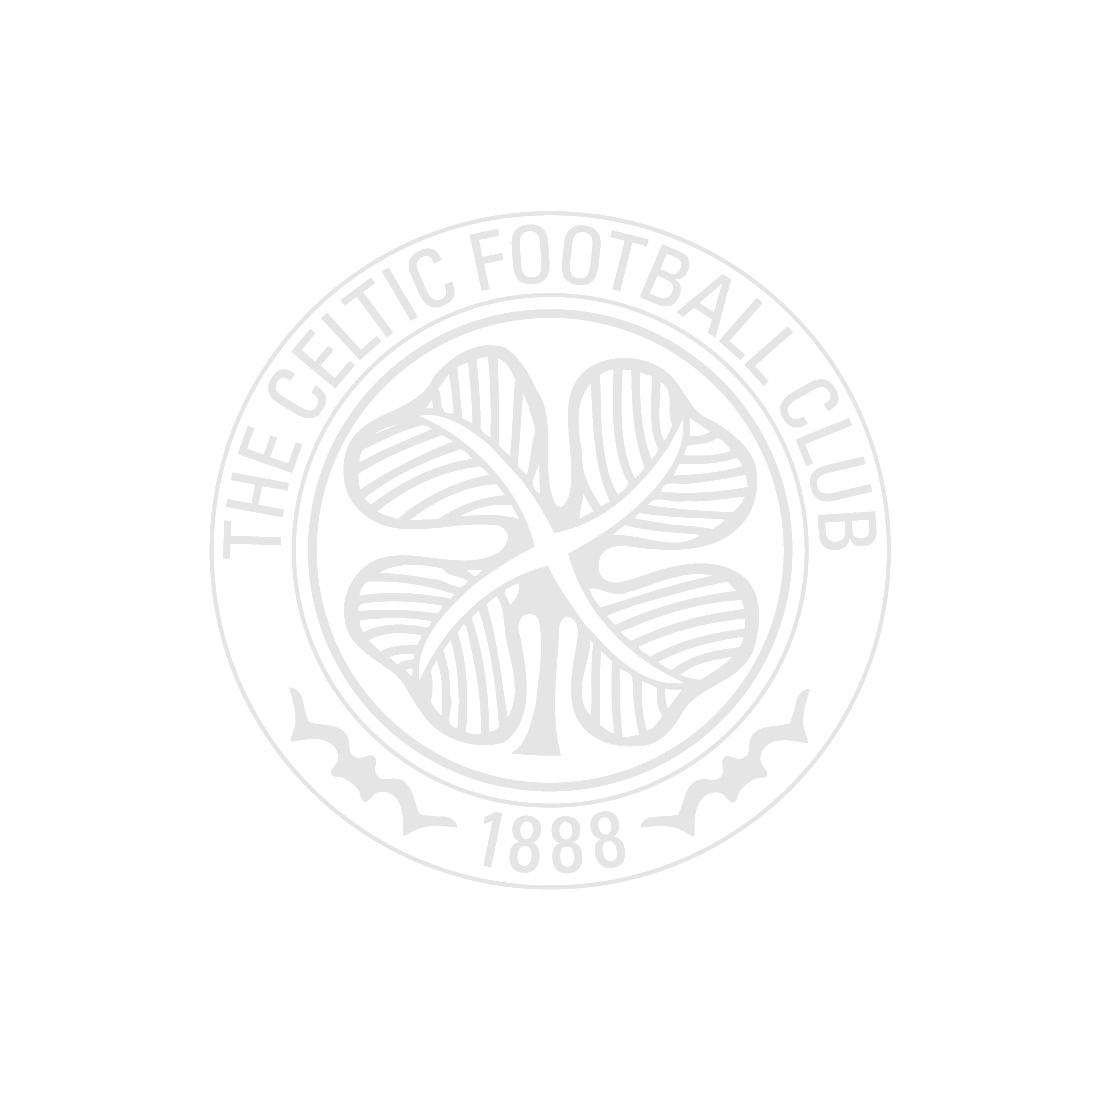 Celtic FC Brown Autograph Mug